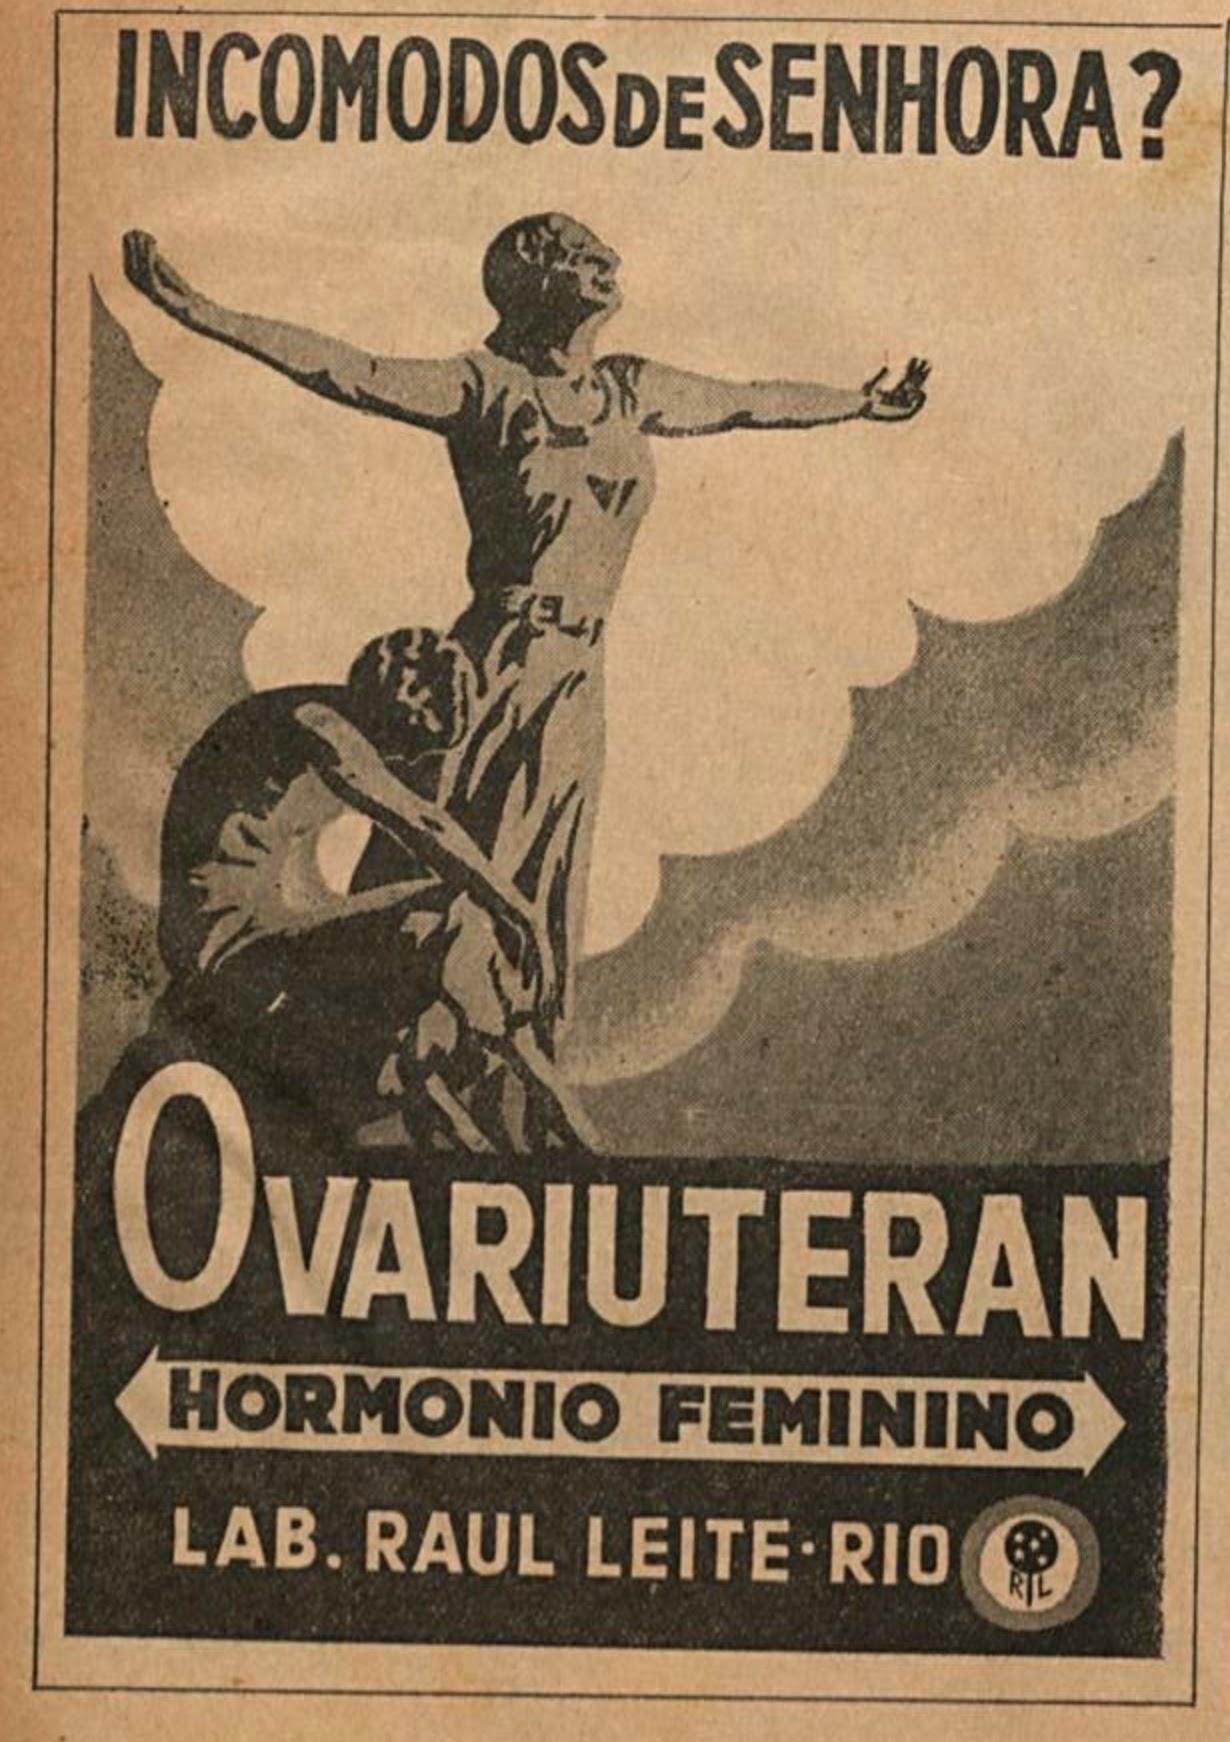 Propaganda antiga do Ovariuteran veiculada em 1935